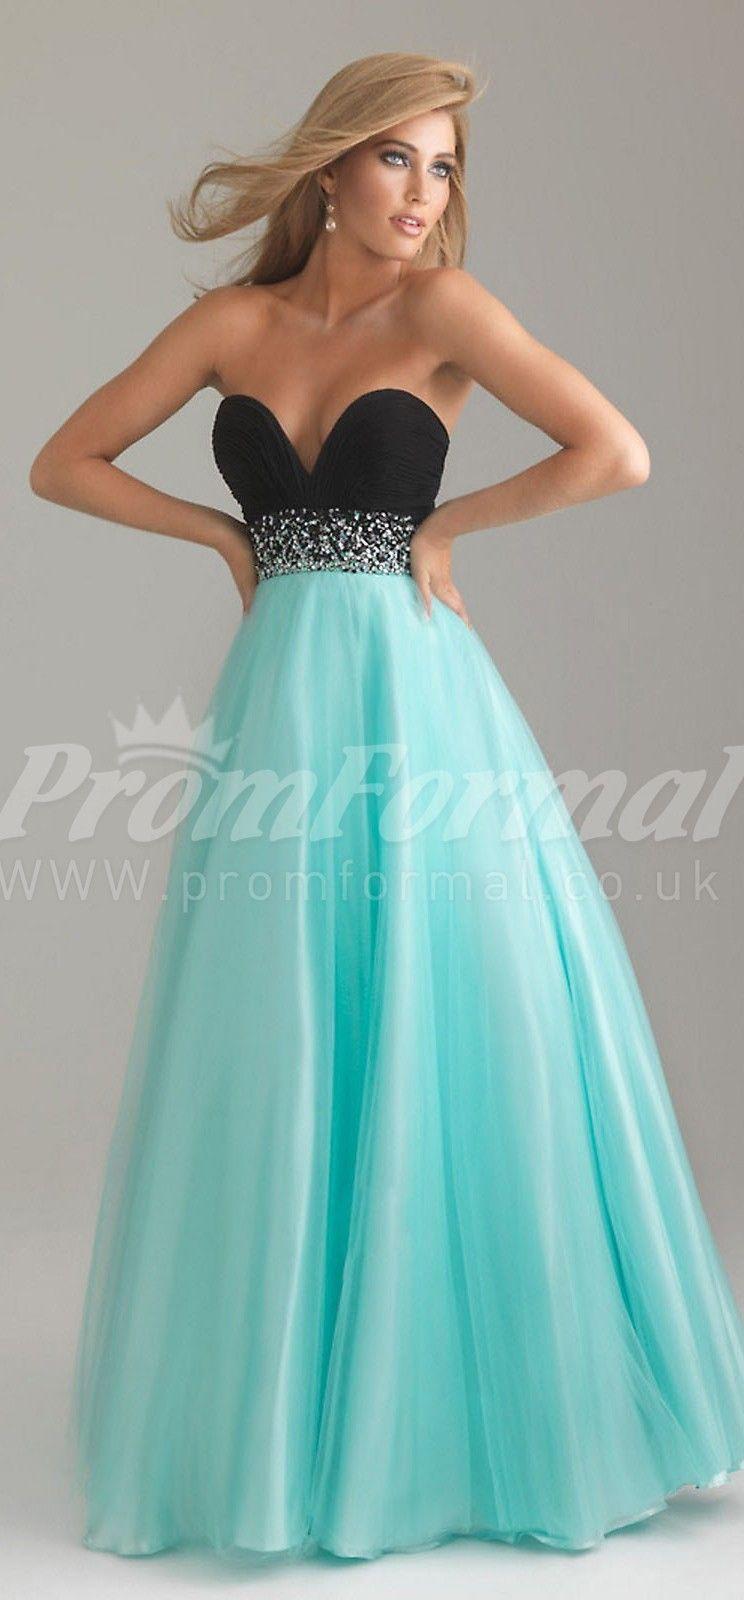 Light Blue long prom dresses,ball gown dresses | Prom dresses ...